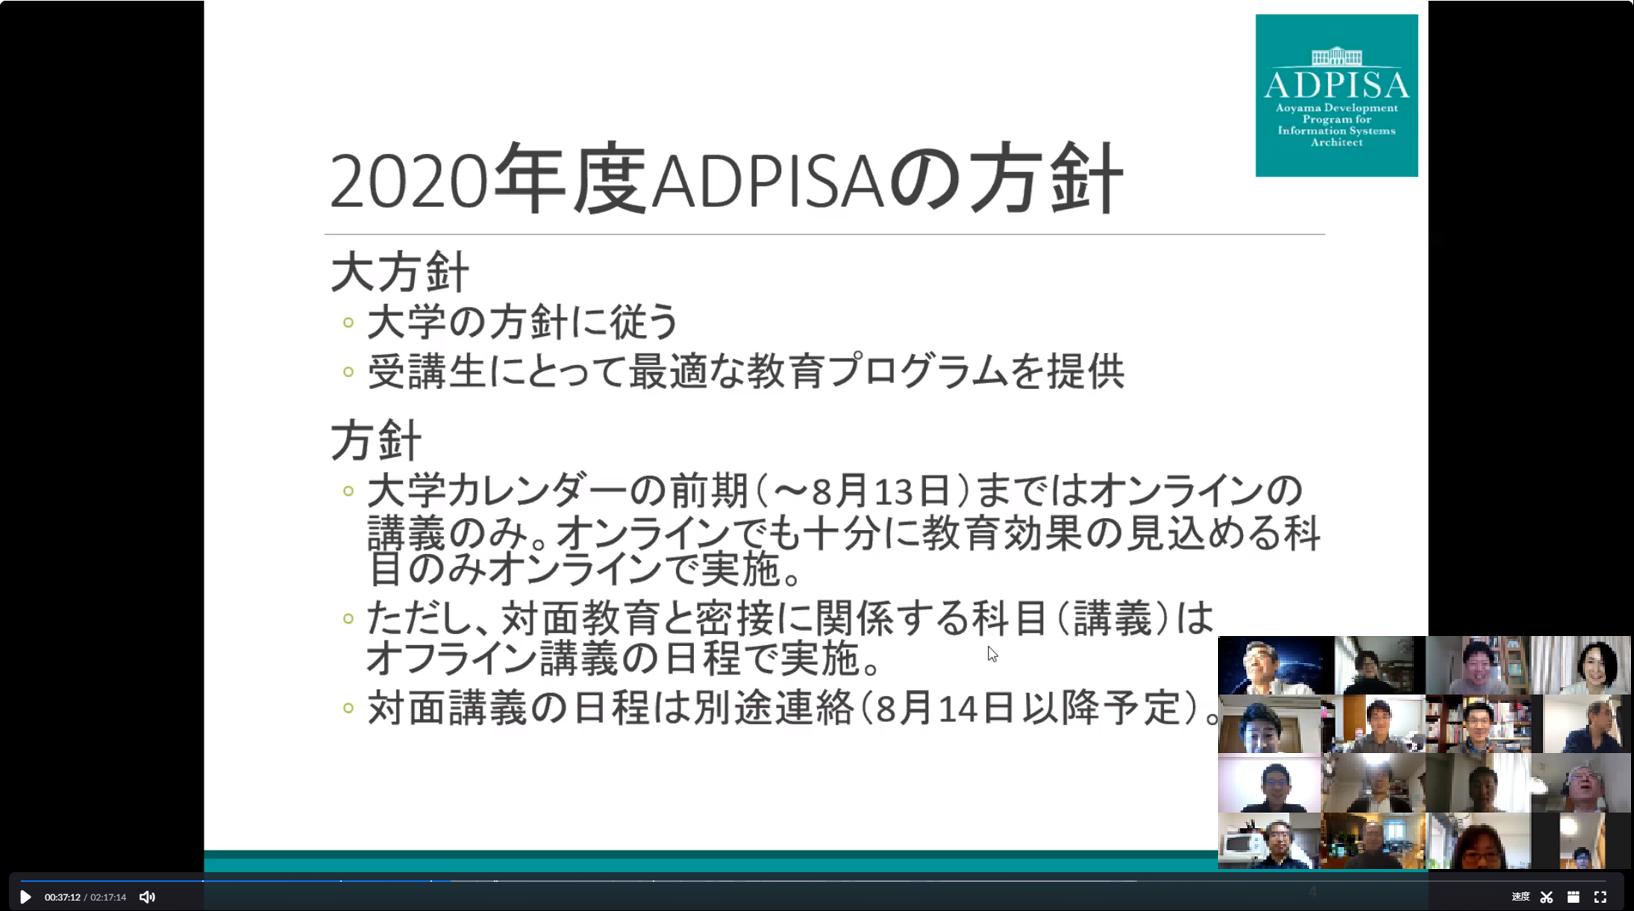 ADPISA_Online (1).png